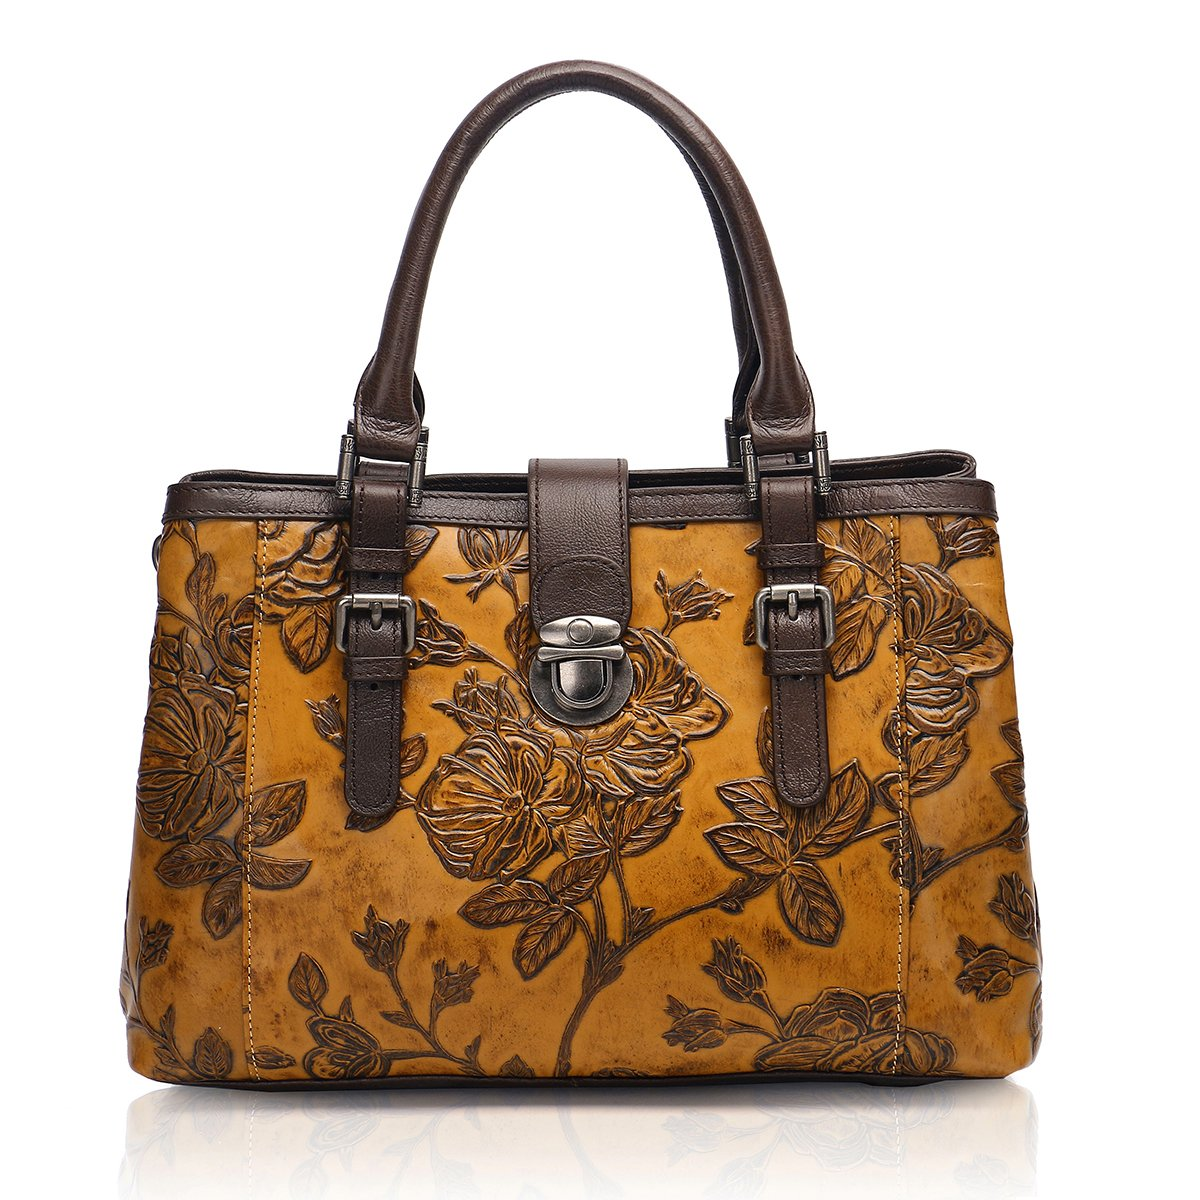 APHISON Designer Unique Embossed Floral Cowhide Leather Tote Style Ladies Top Handle Bags Handbags C817 (BROWN)